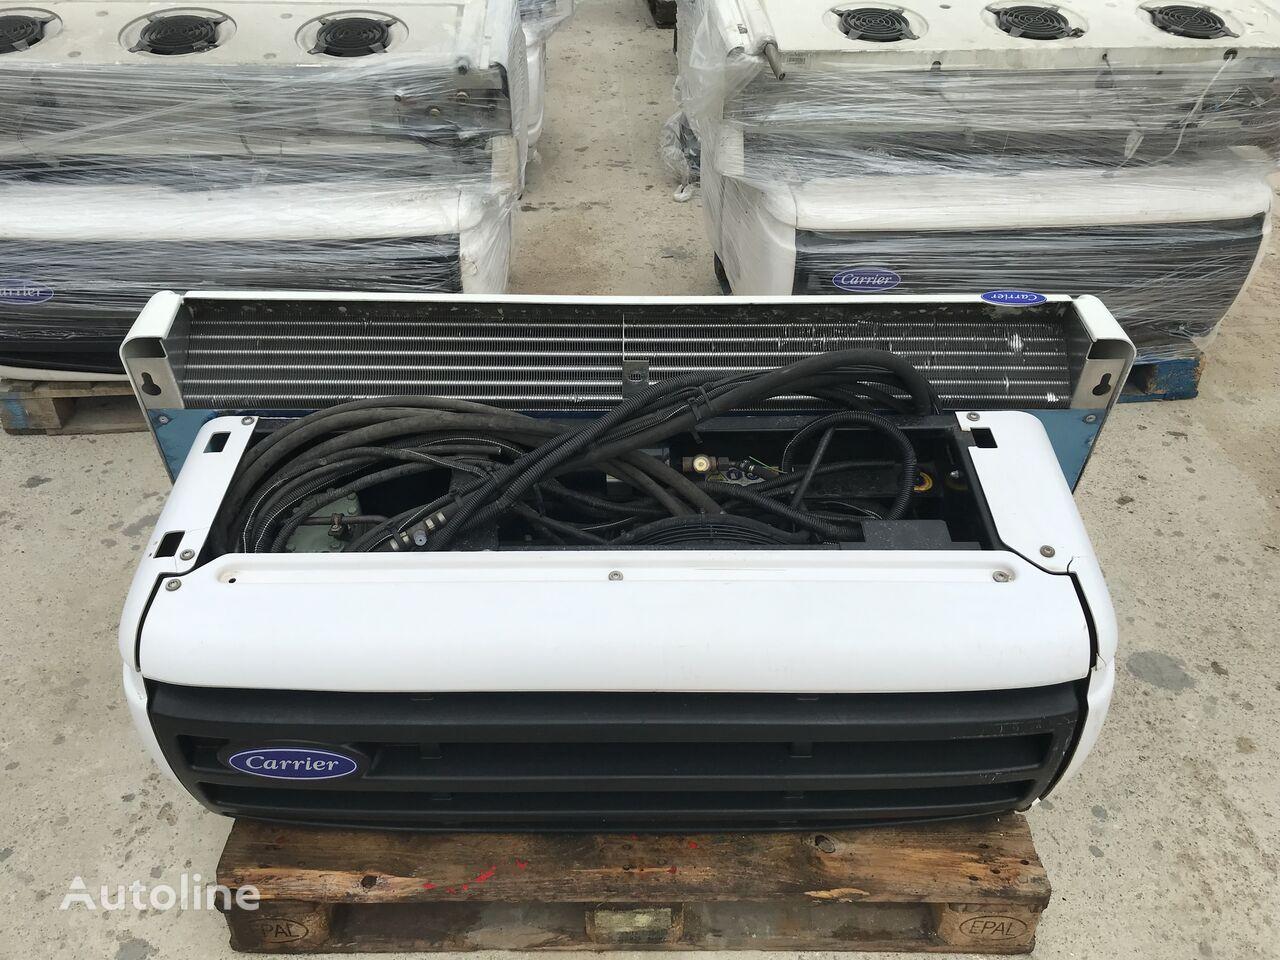 CARRIER - XARIOS 600 refrigeration unit